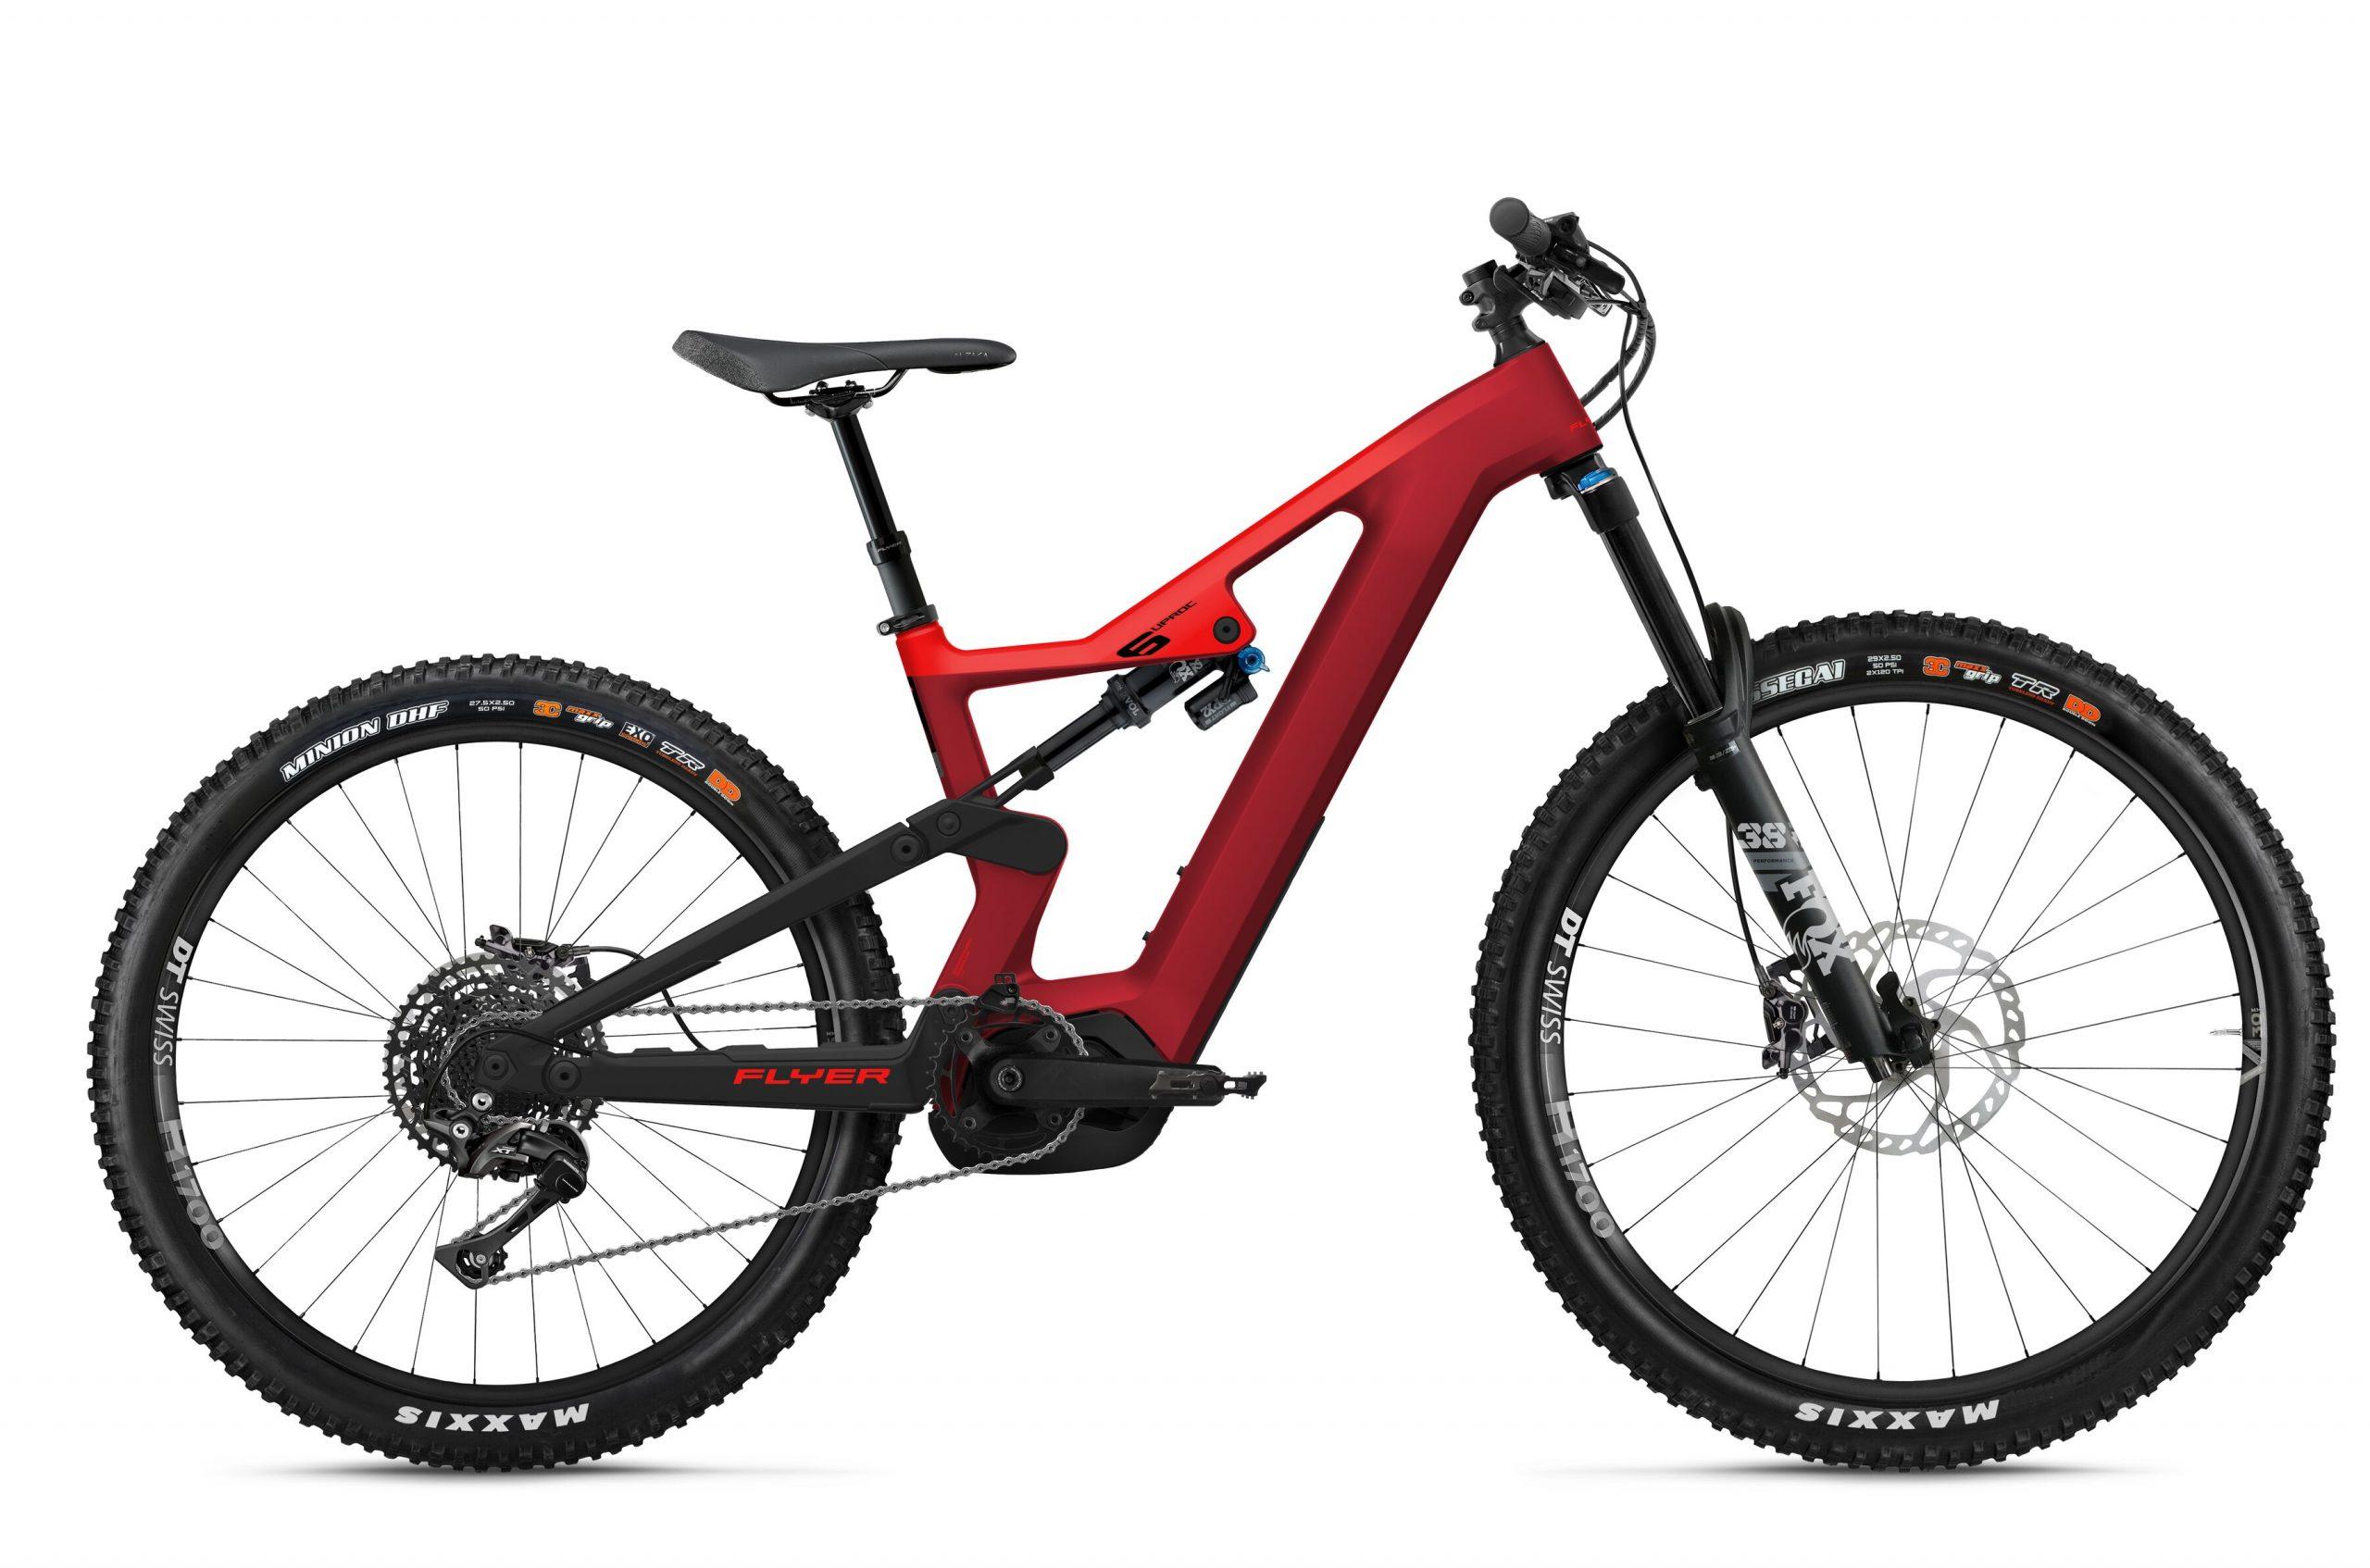 Online-FLYER_E-Bikes_MY21_Uproc6_870_Fullsuspension_PulseRedMarsRedSatin WEB